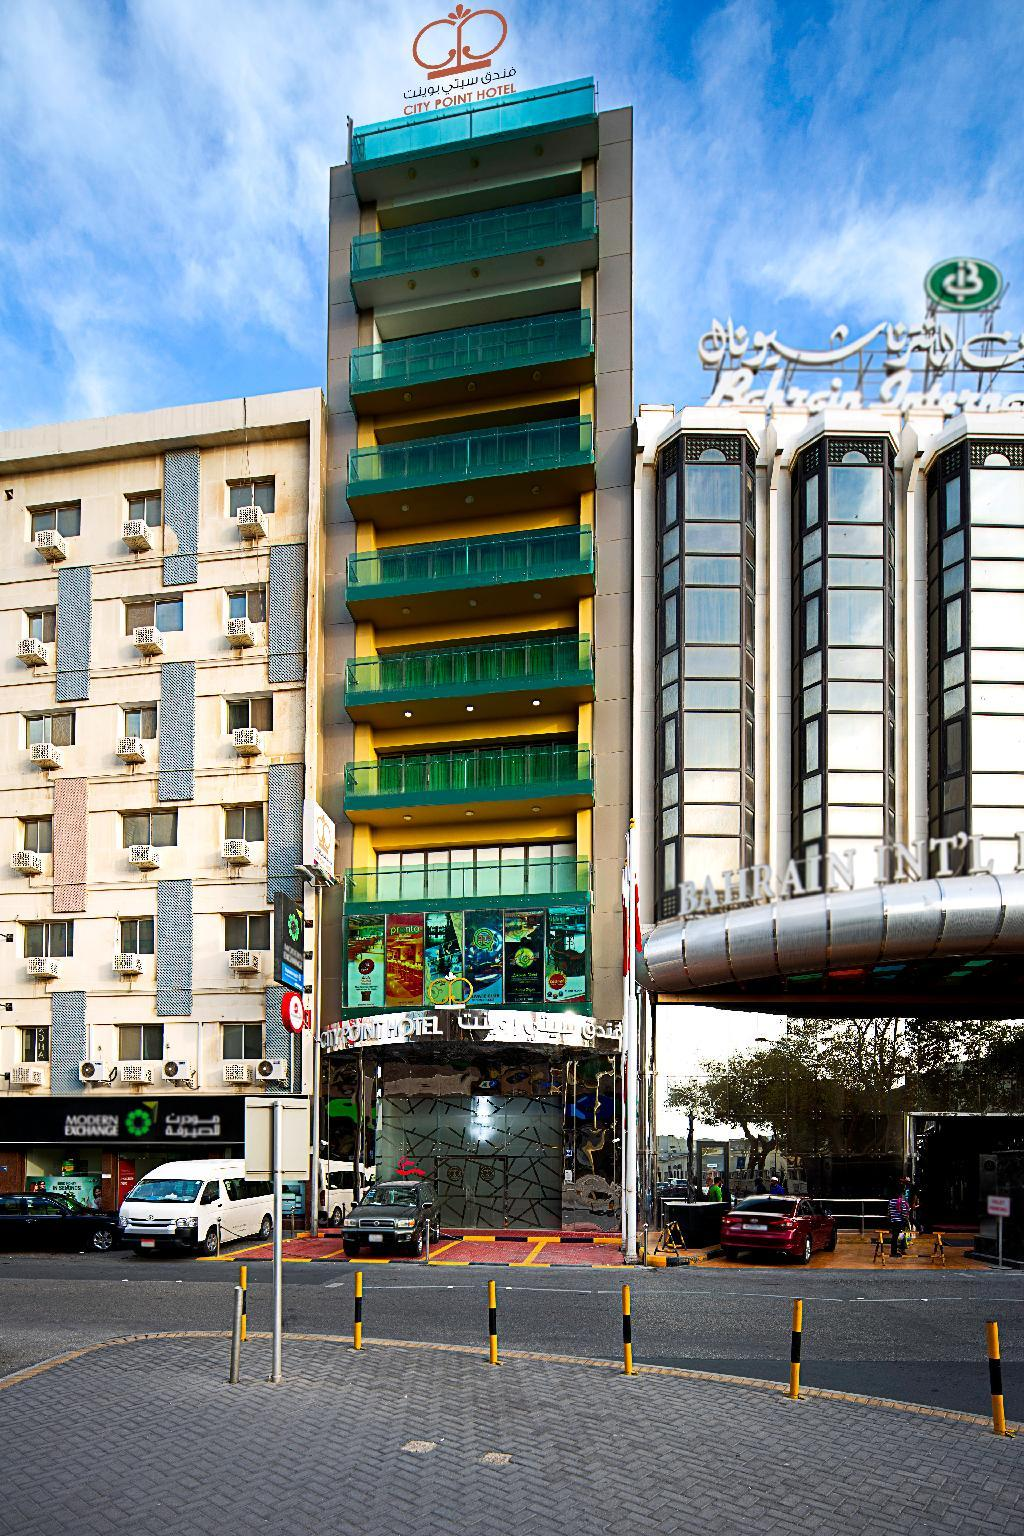 CITY POINT HOTEL